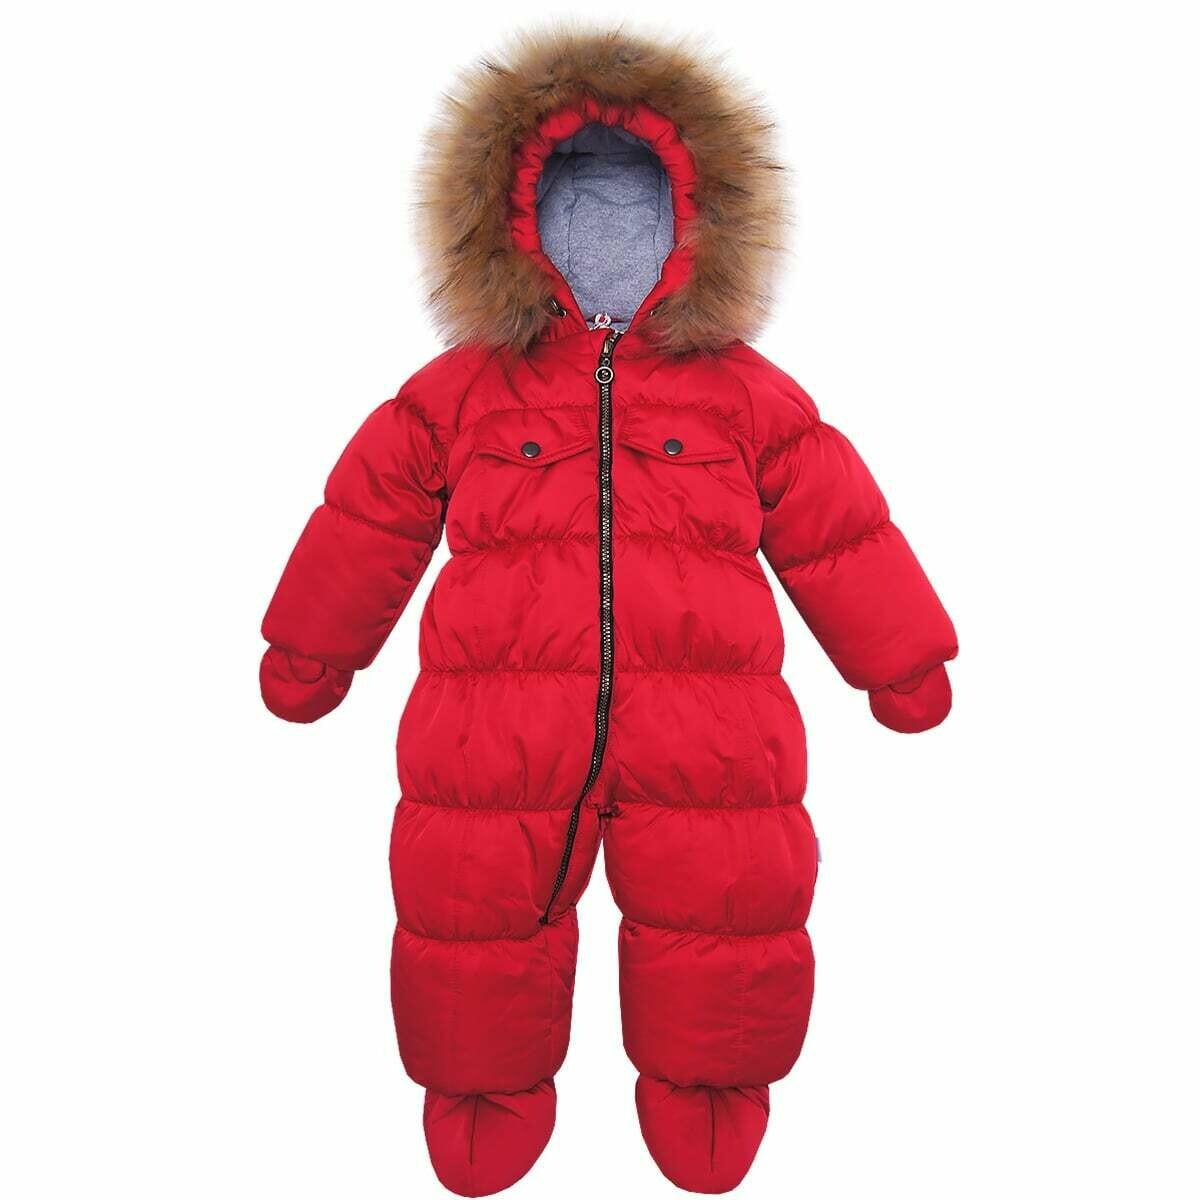 Комбинезон Аляска, зима, красный